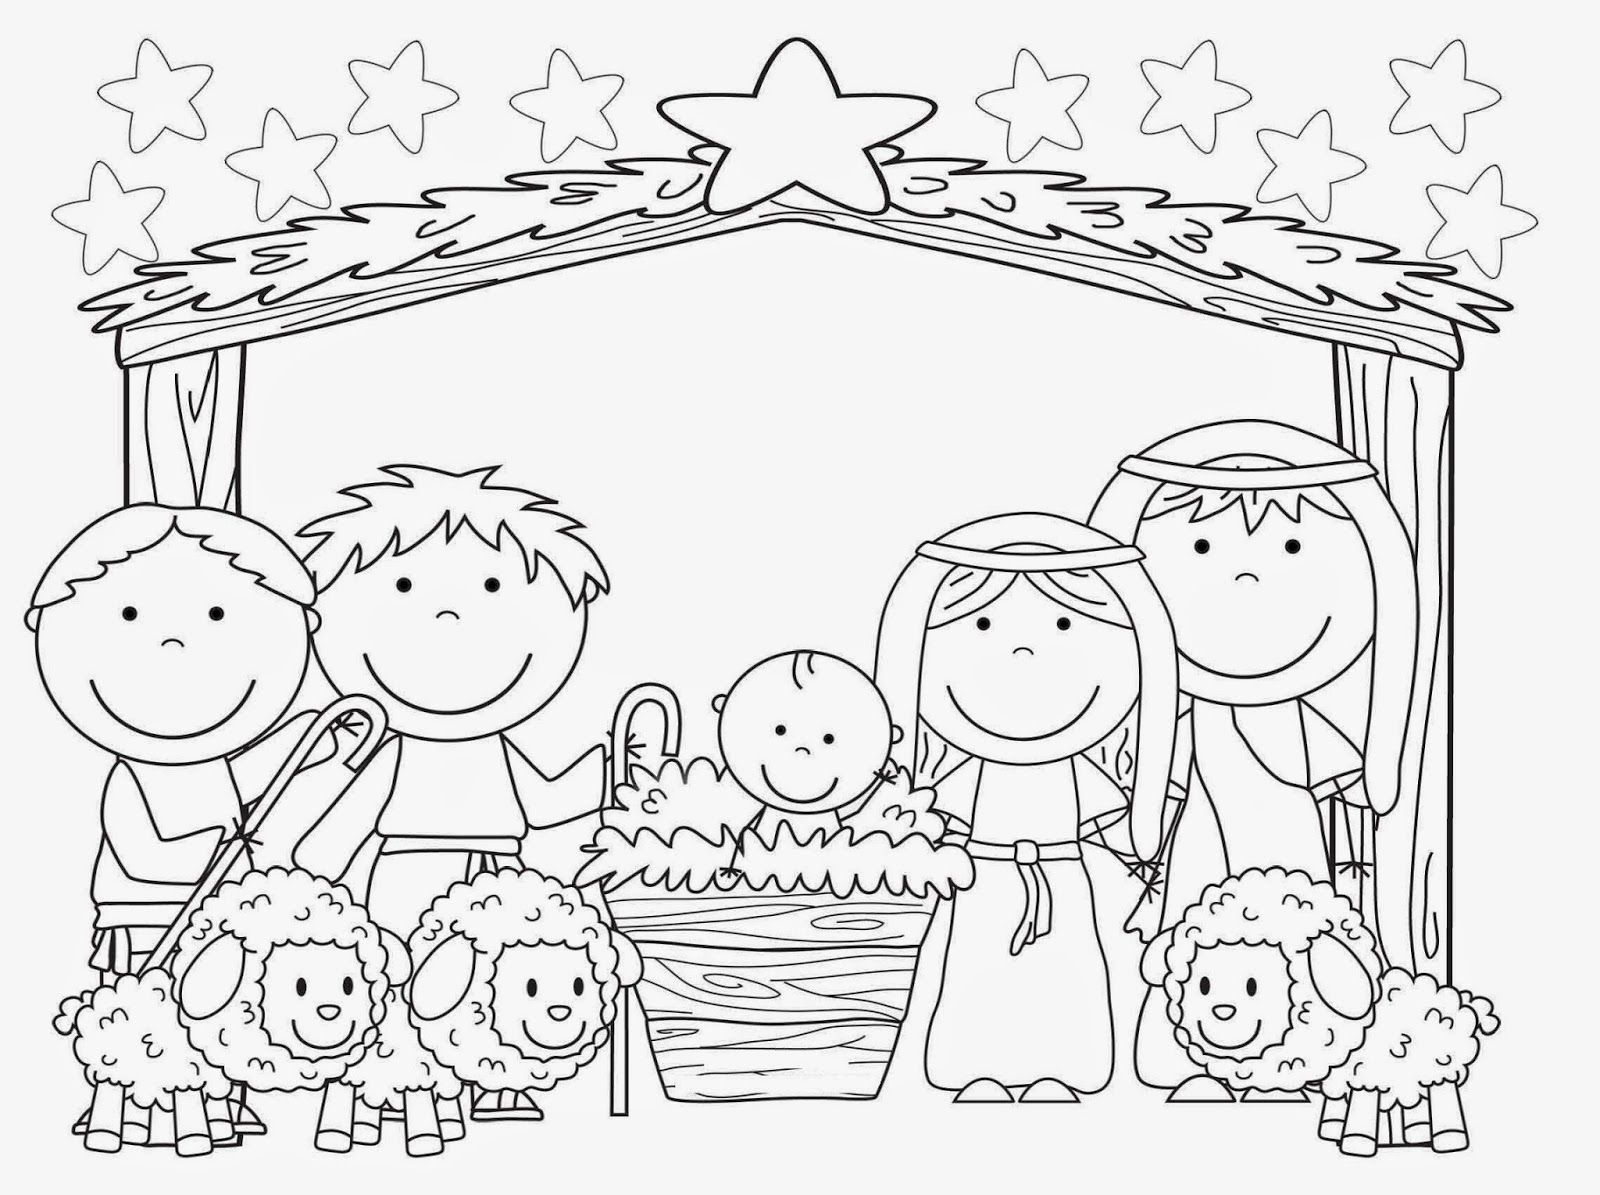 mikapanteleon-PawakomastoNhpiagwgeio: Χριστουγεννιάτικες ...